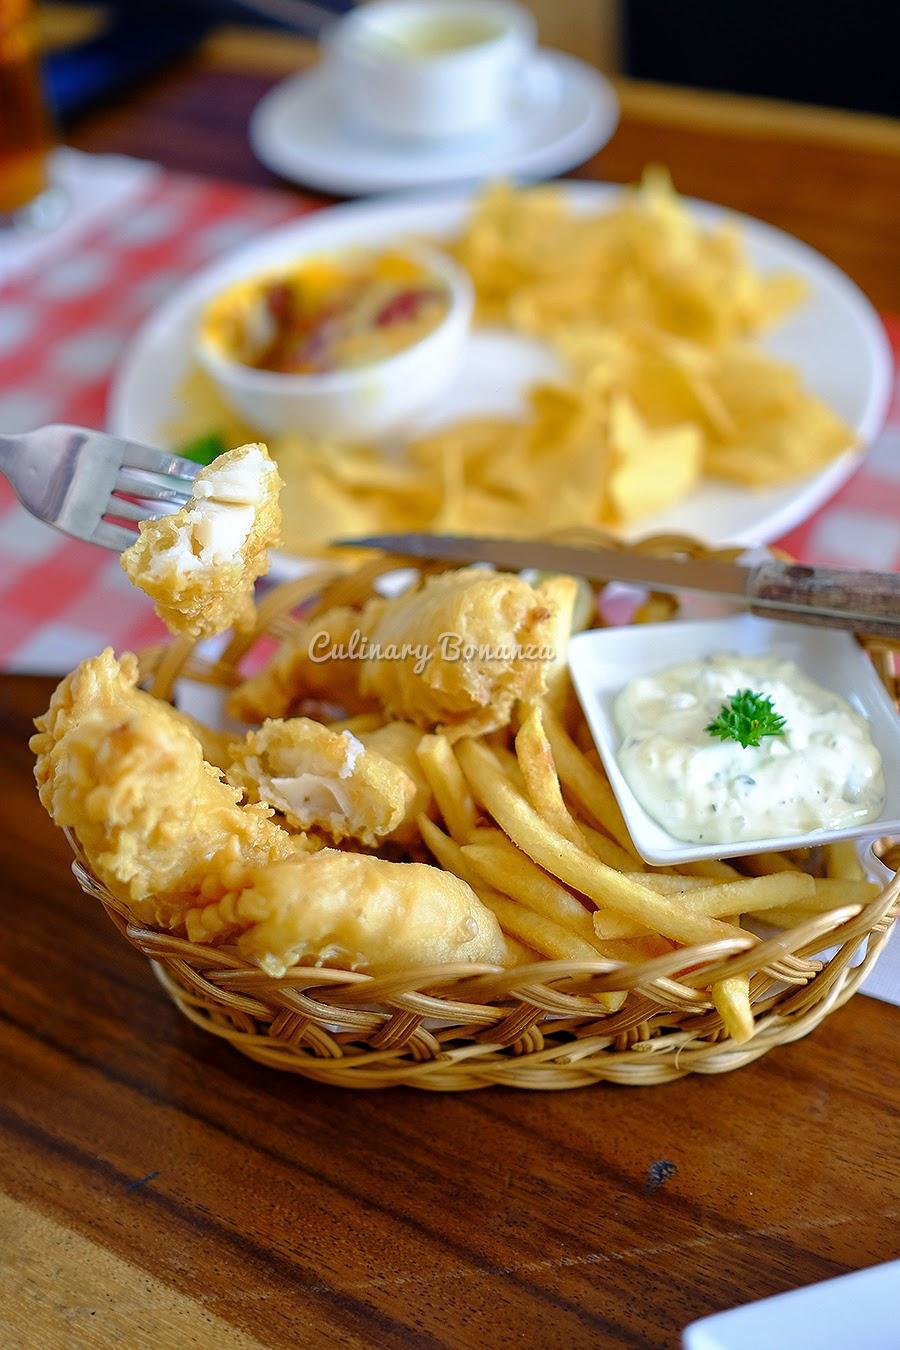 Fish & chips, with tartar sauce